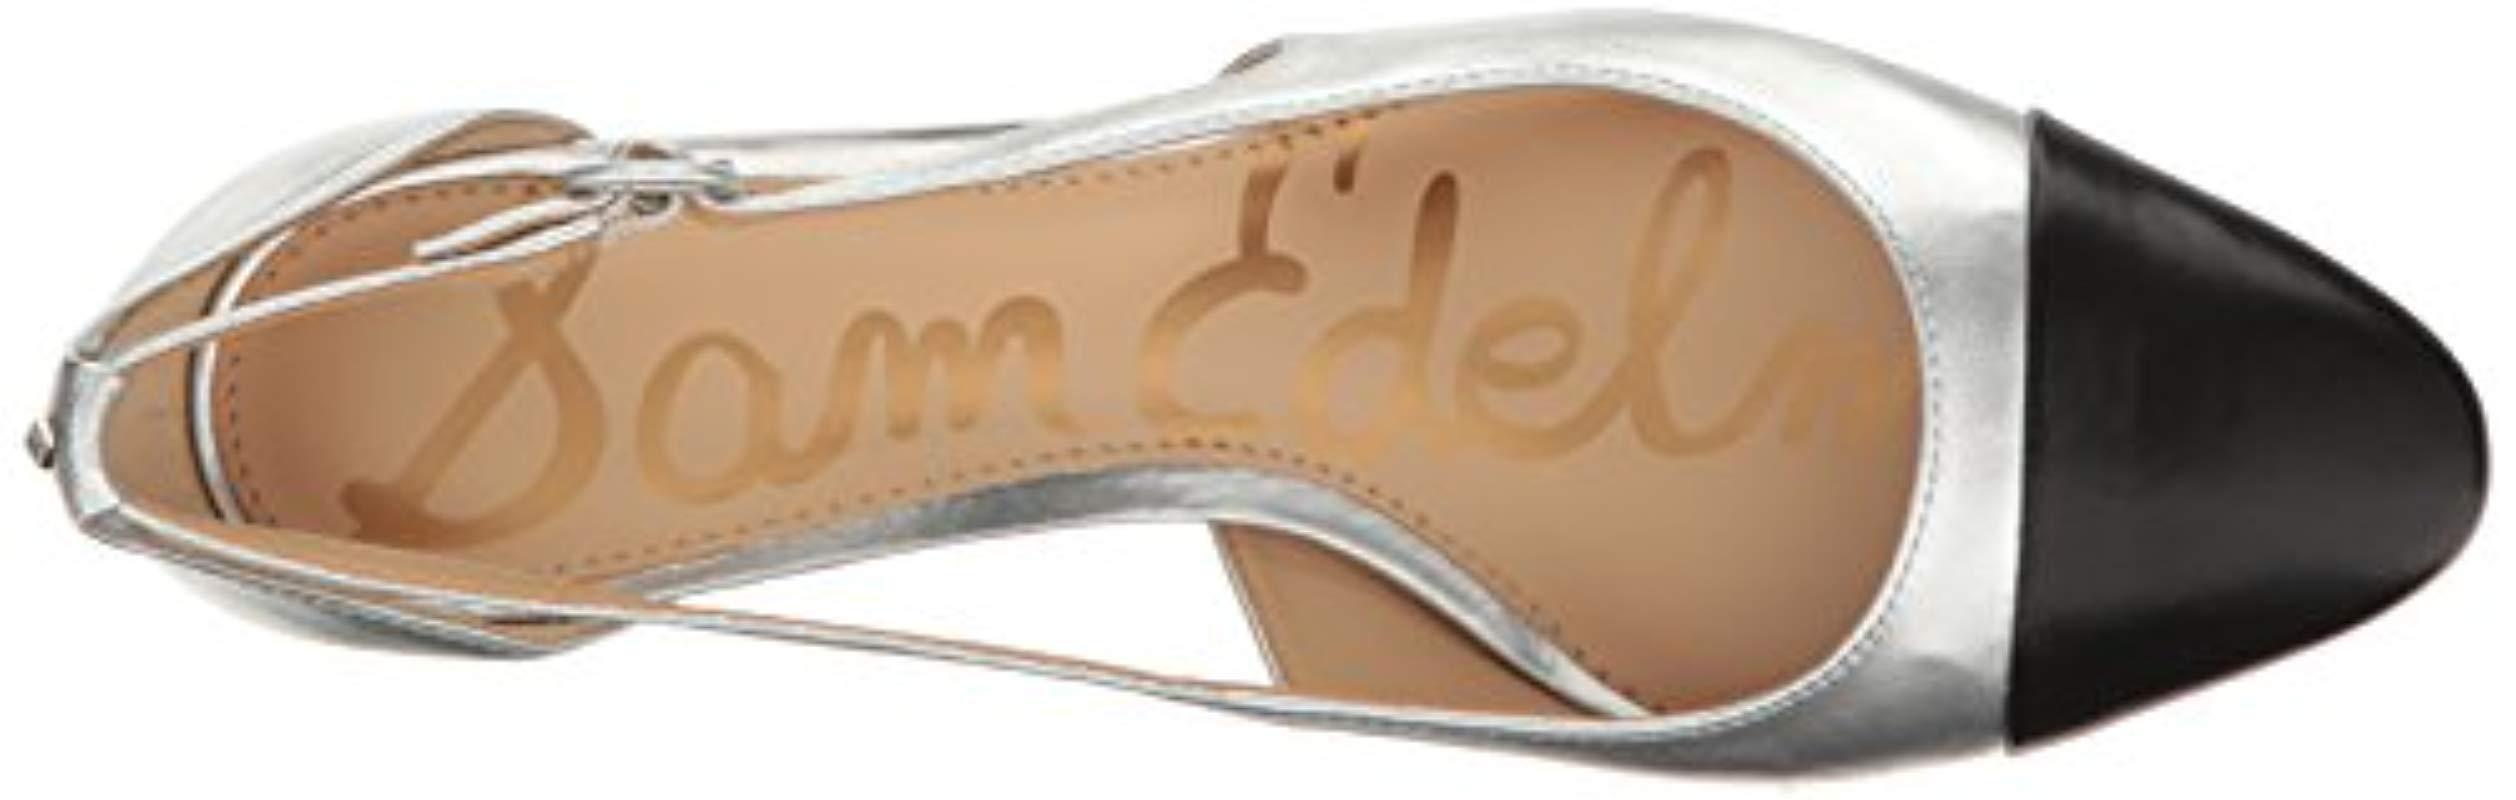 86850effe57 Sam Edelman - Metallic Leah Cutout Block Heel - Lyst. View fullscreen